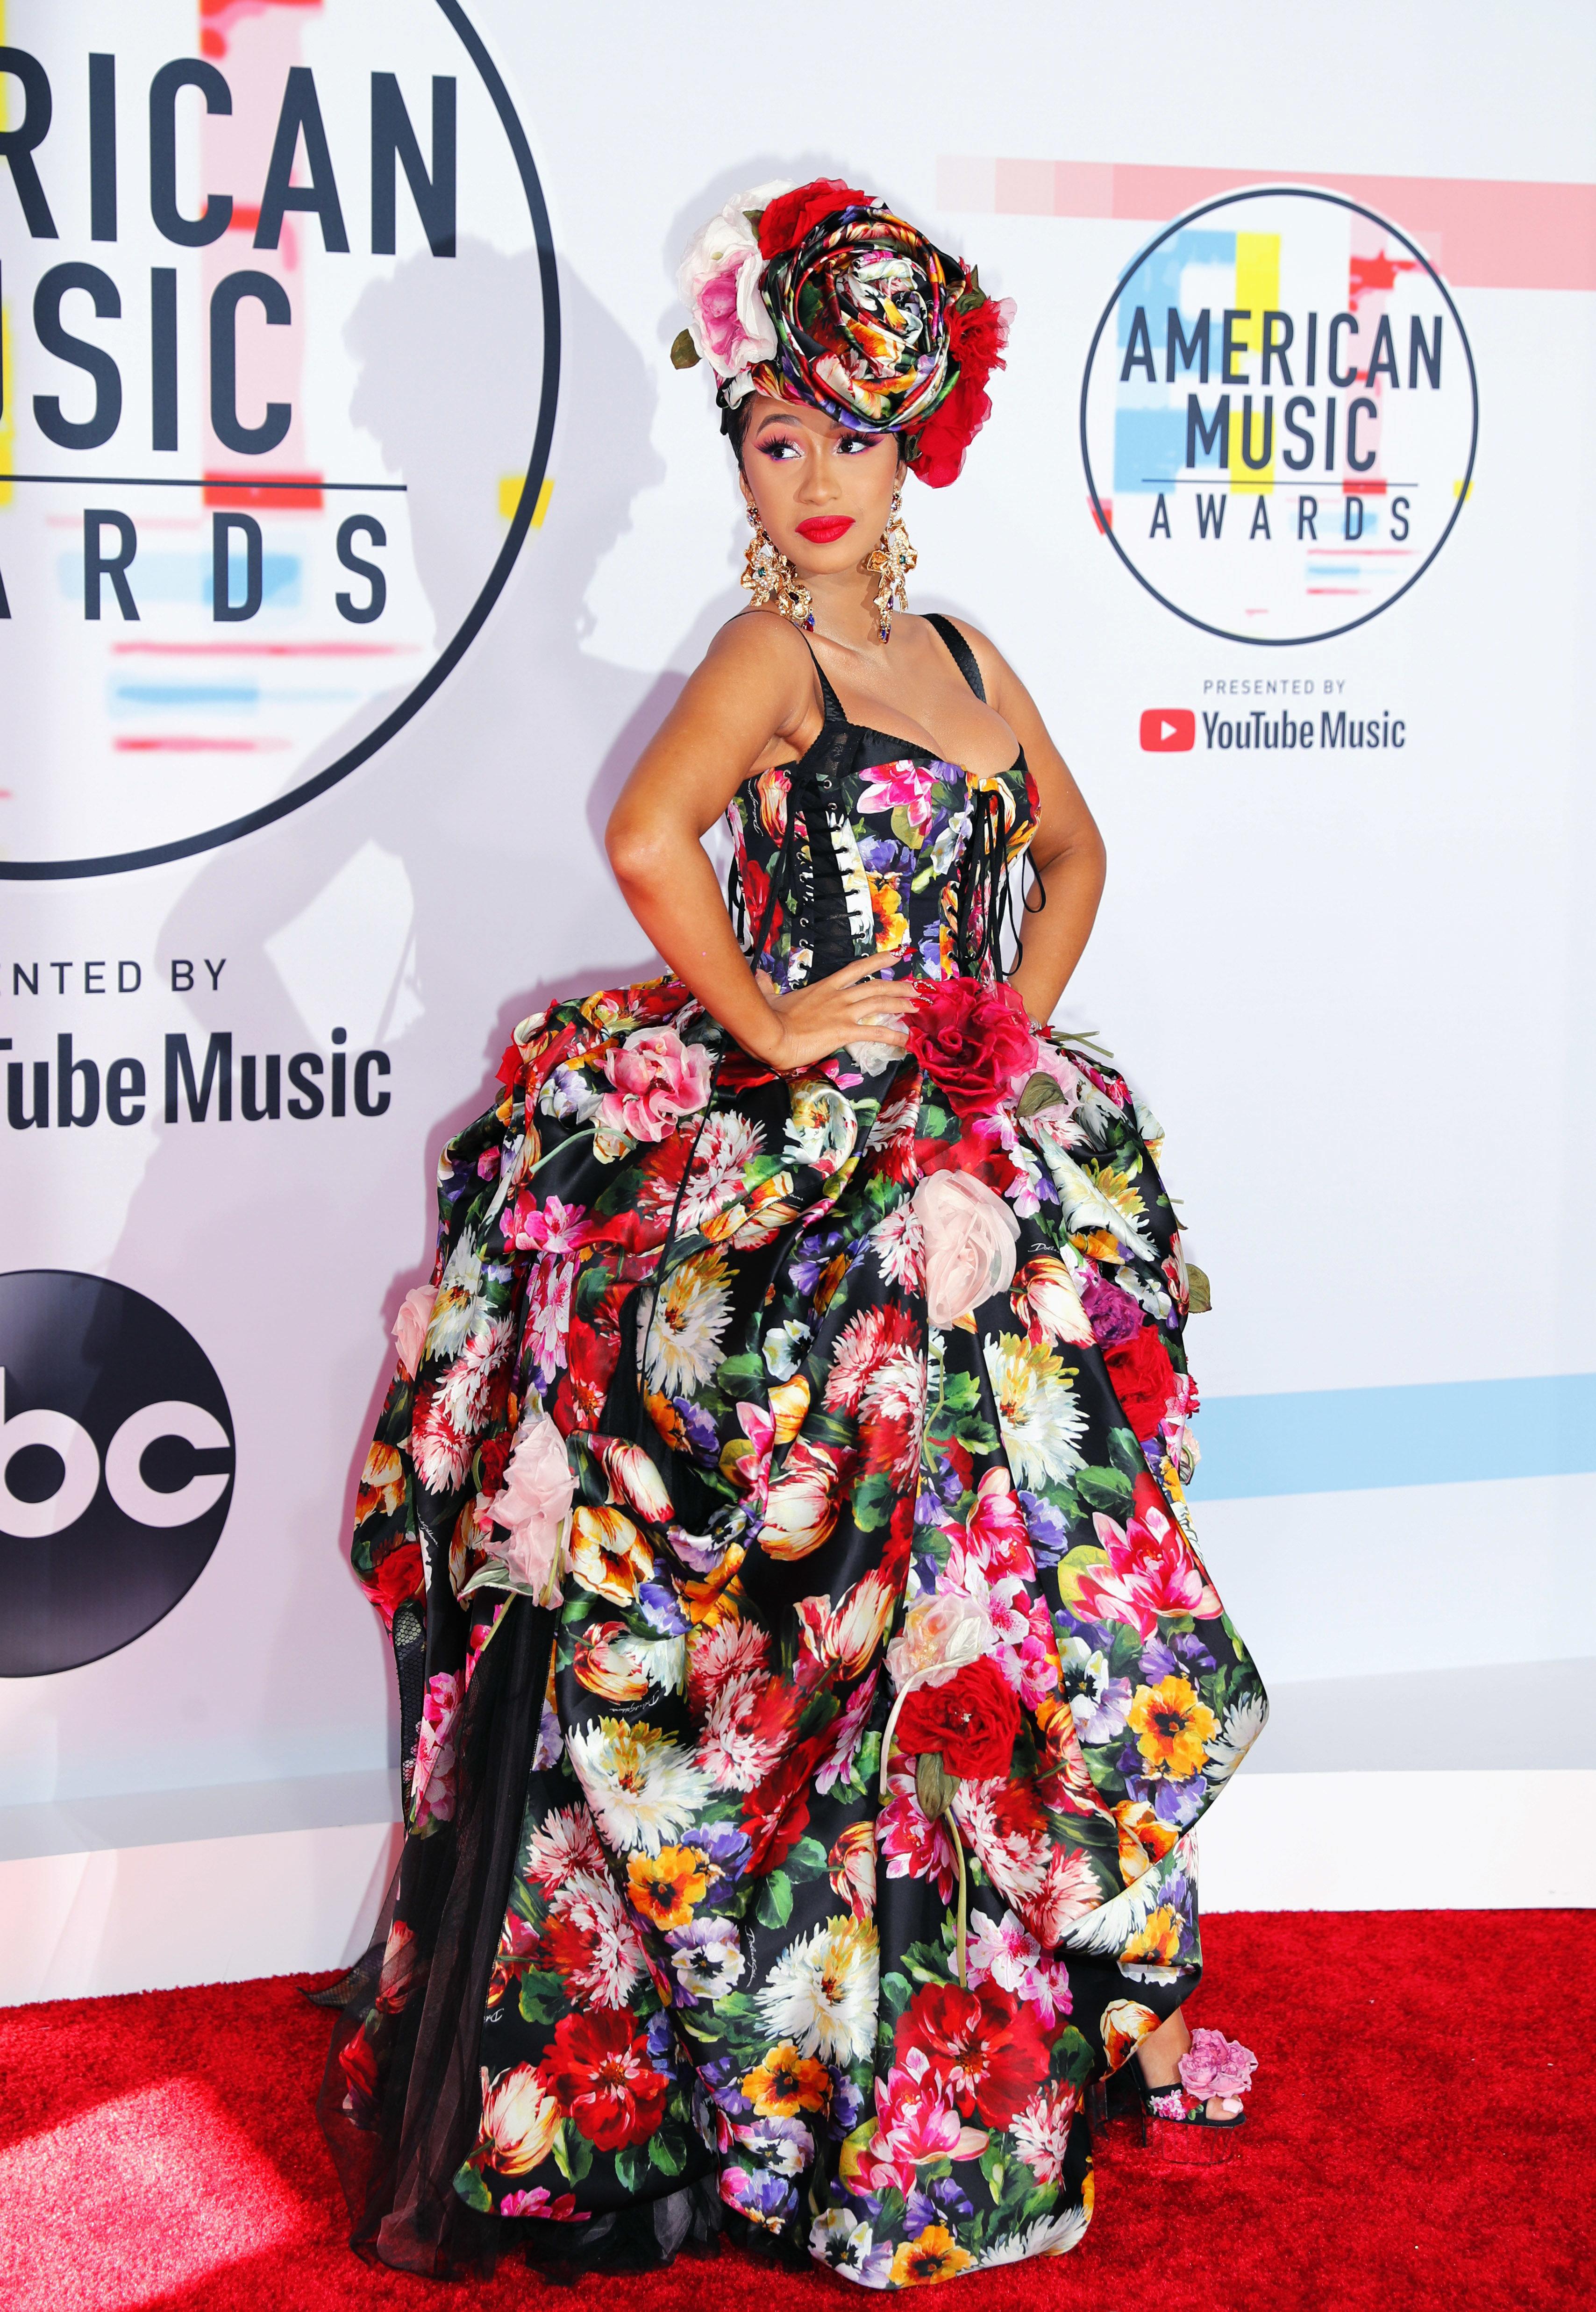 2018 American Music Awards – Arrivals – Los Angeles, California, U.S., 09/10/2018 – Cardi B poses. REUTERS/Mike Blake